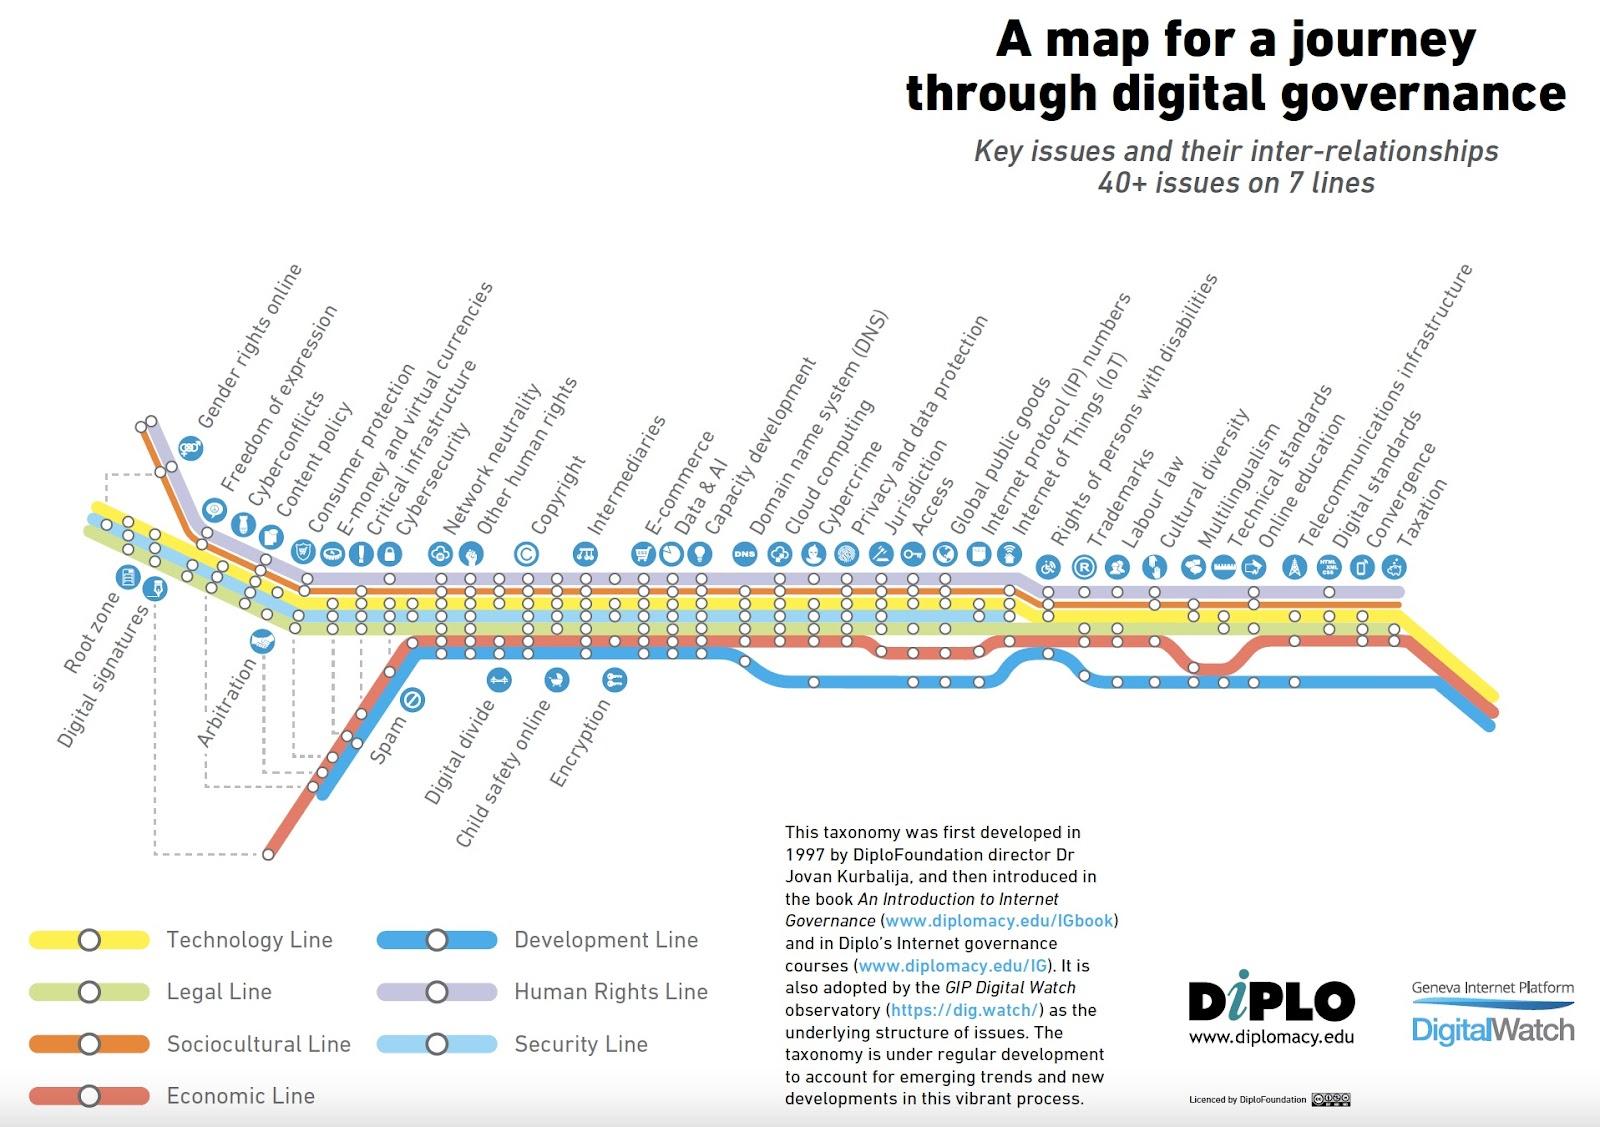 A map of a journey through digital governance.